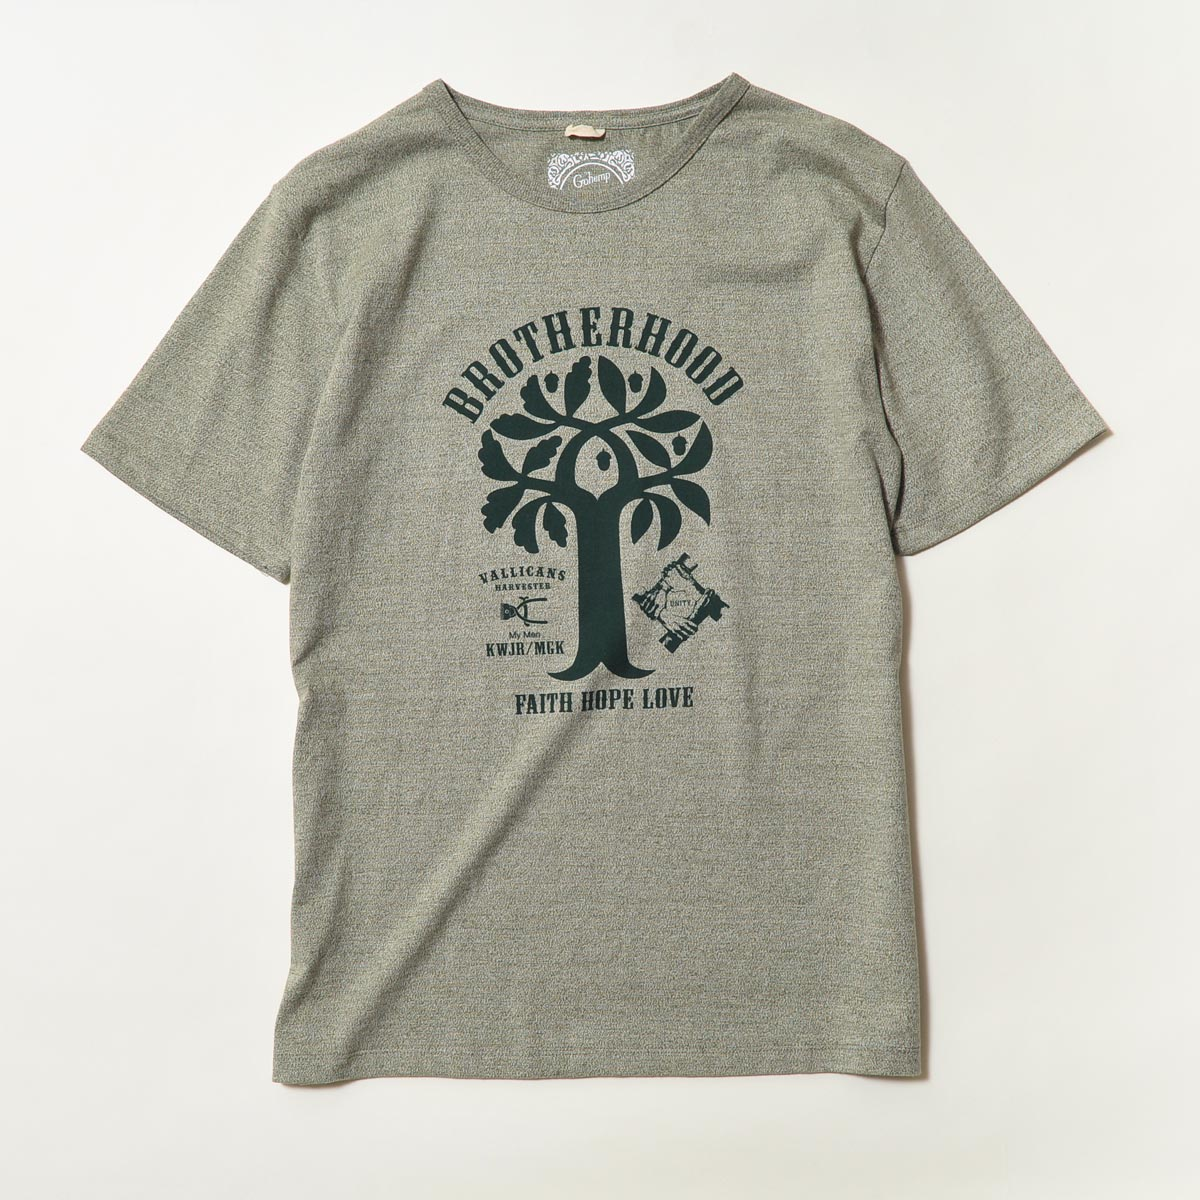 BROTHERHOOD Tシャツ_a0152253_1557614.jpg